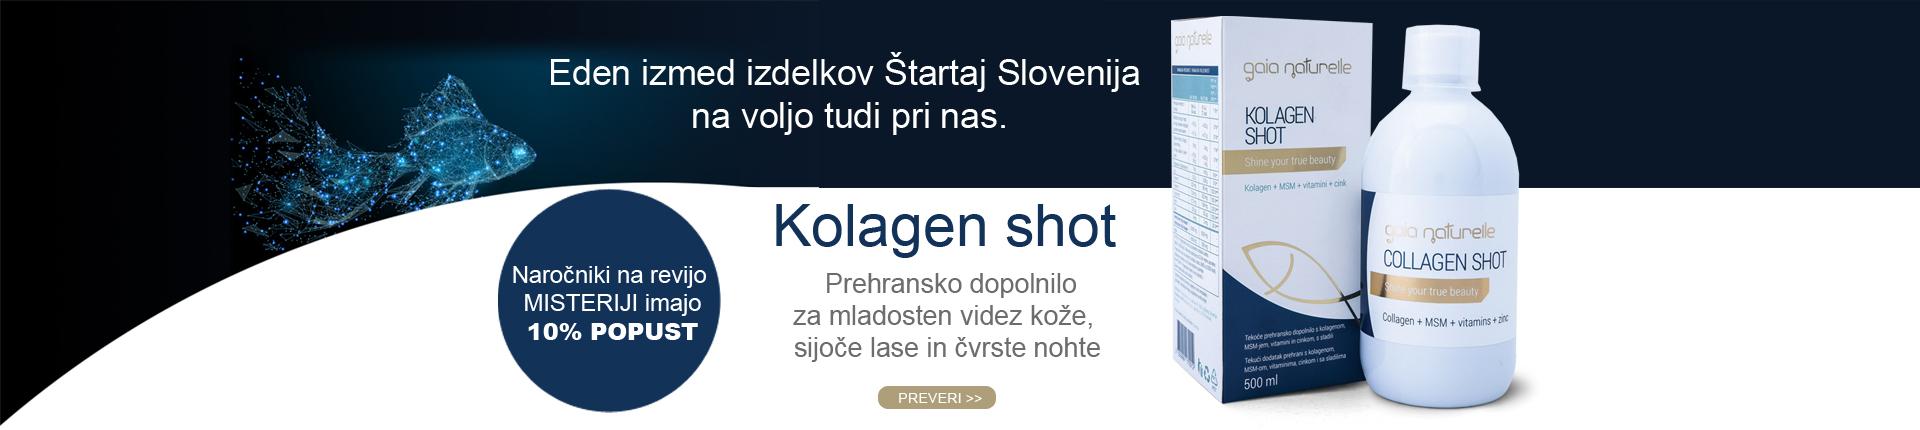 Kolagen shot